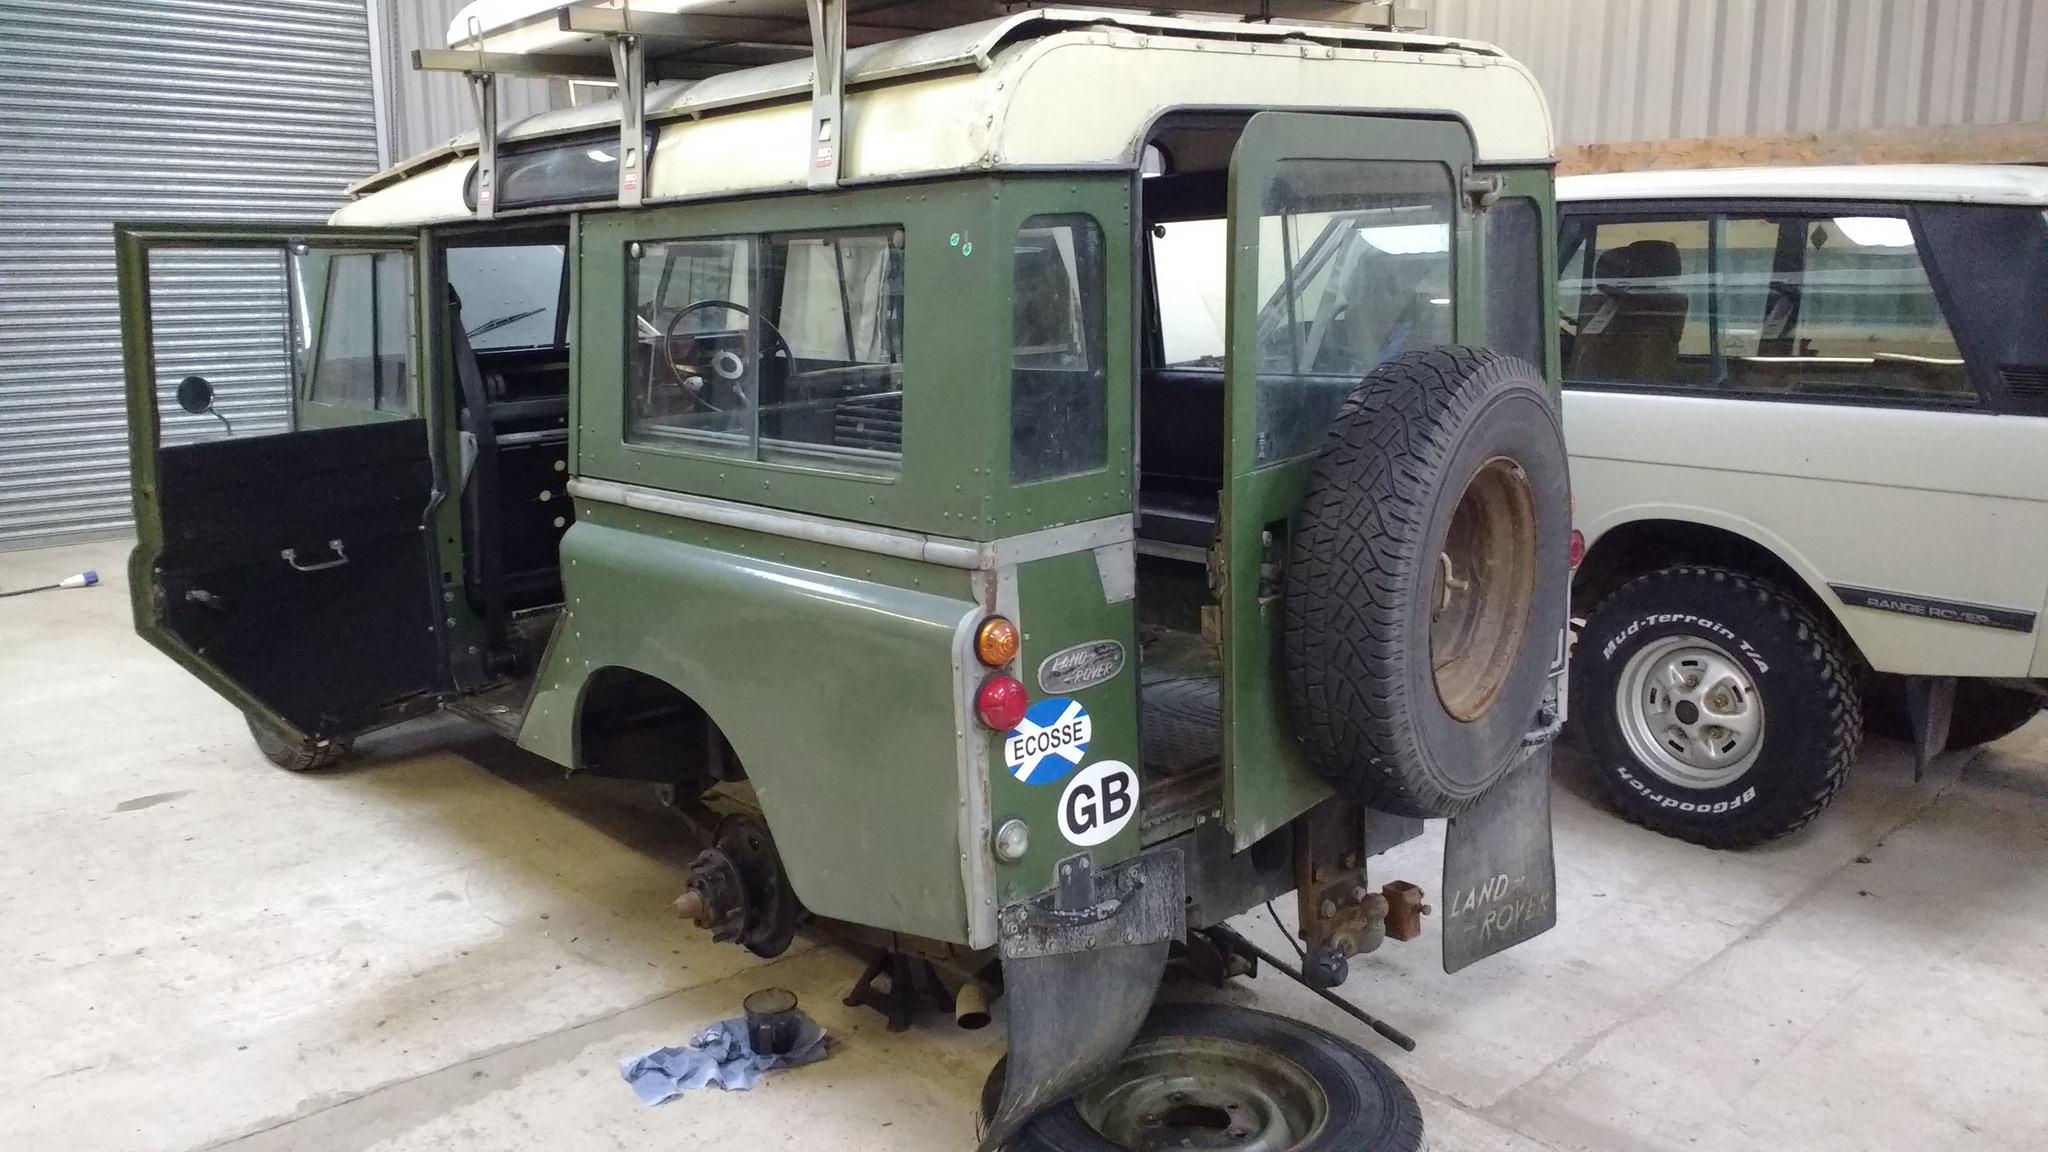 Rusty Land Rovers